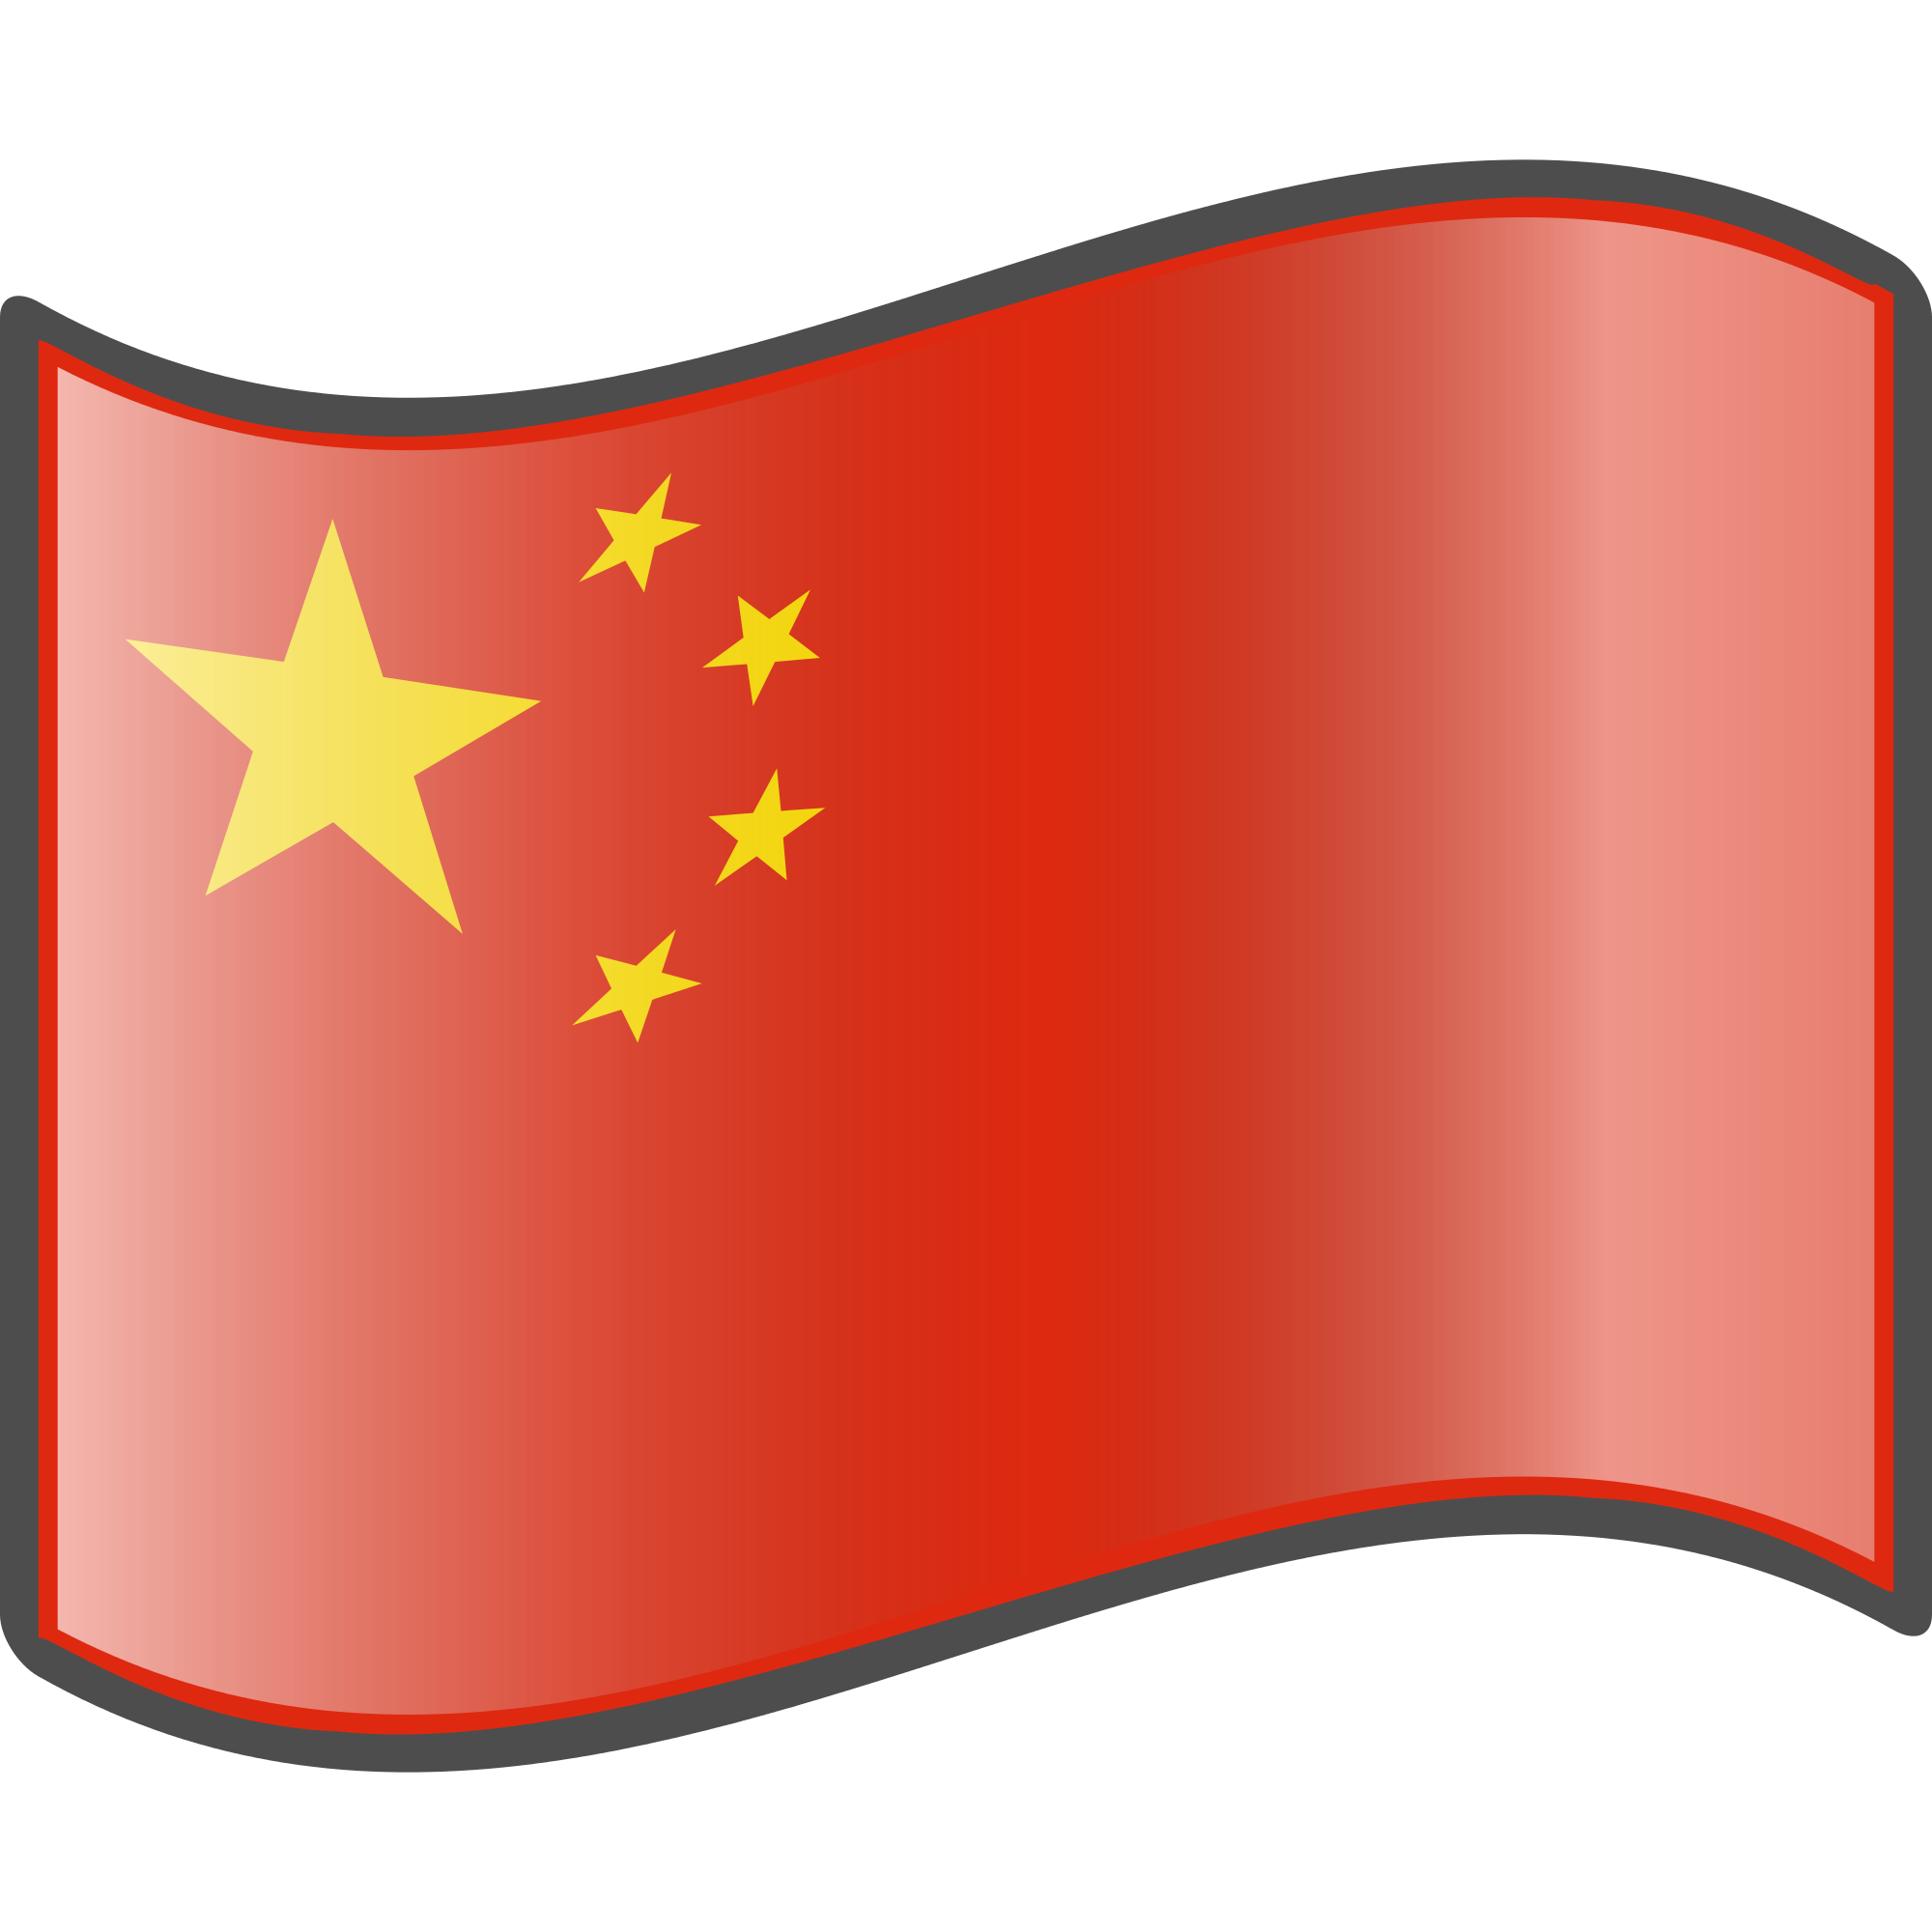 File nuvola chinese svg. China clipart flag china